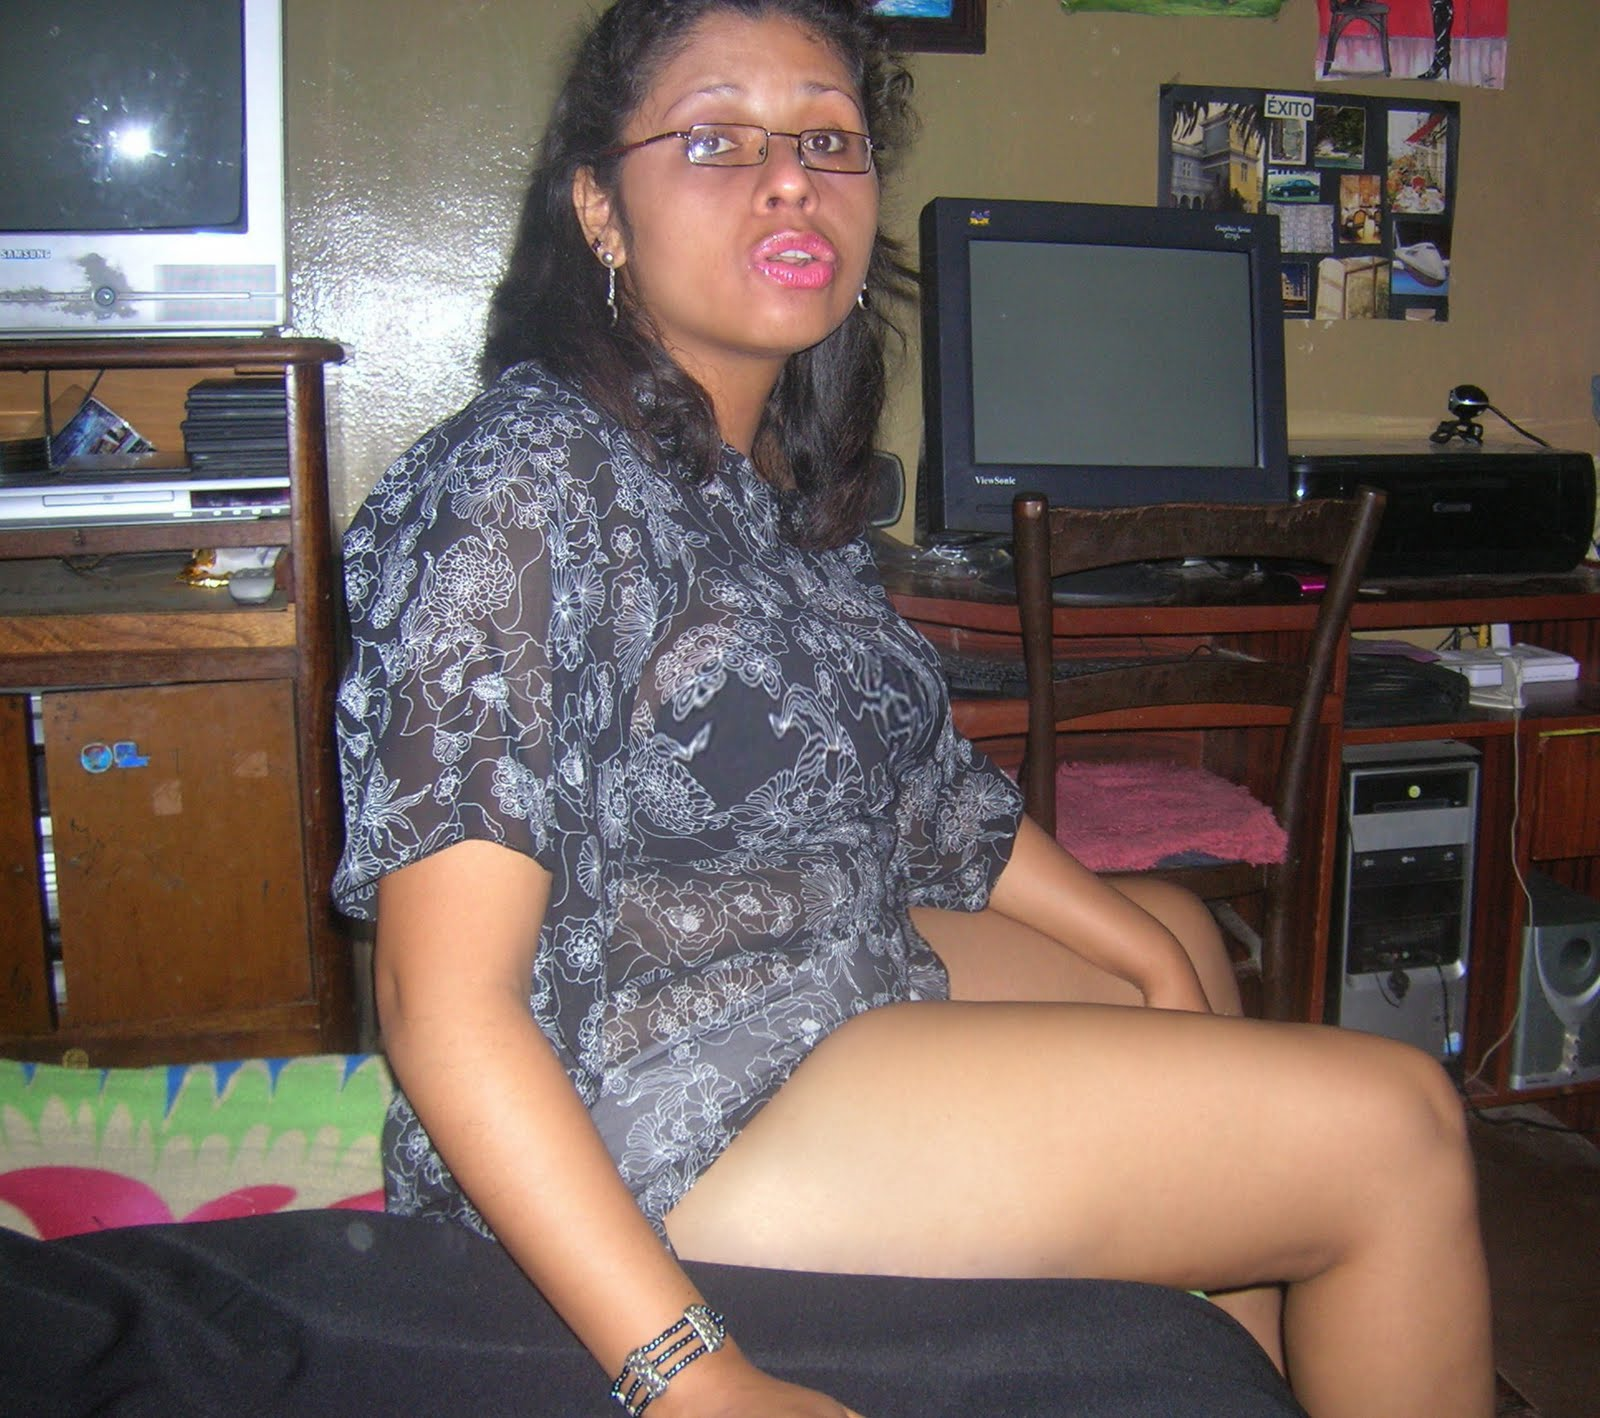 Una Mujer Peruana Muy Peludita Disfrutenla A Esta Senora Joven Madura